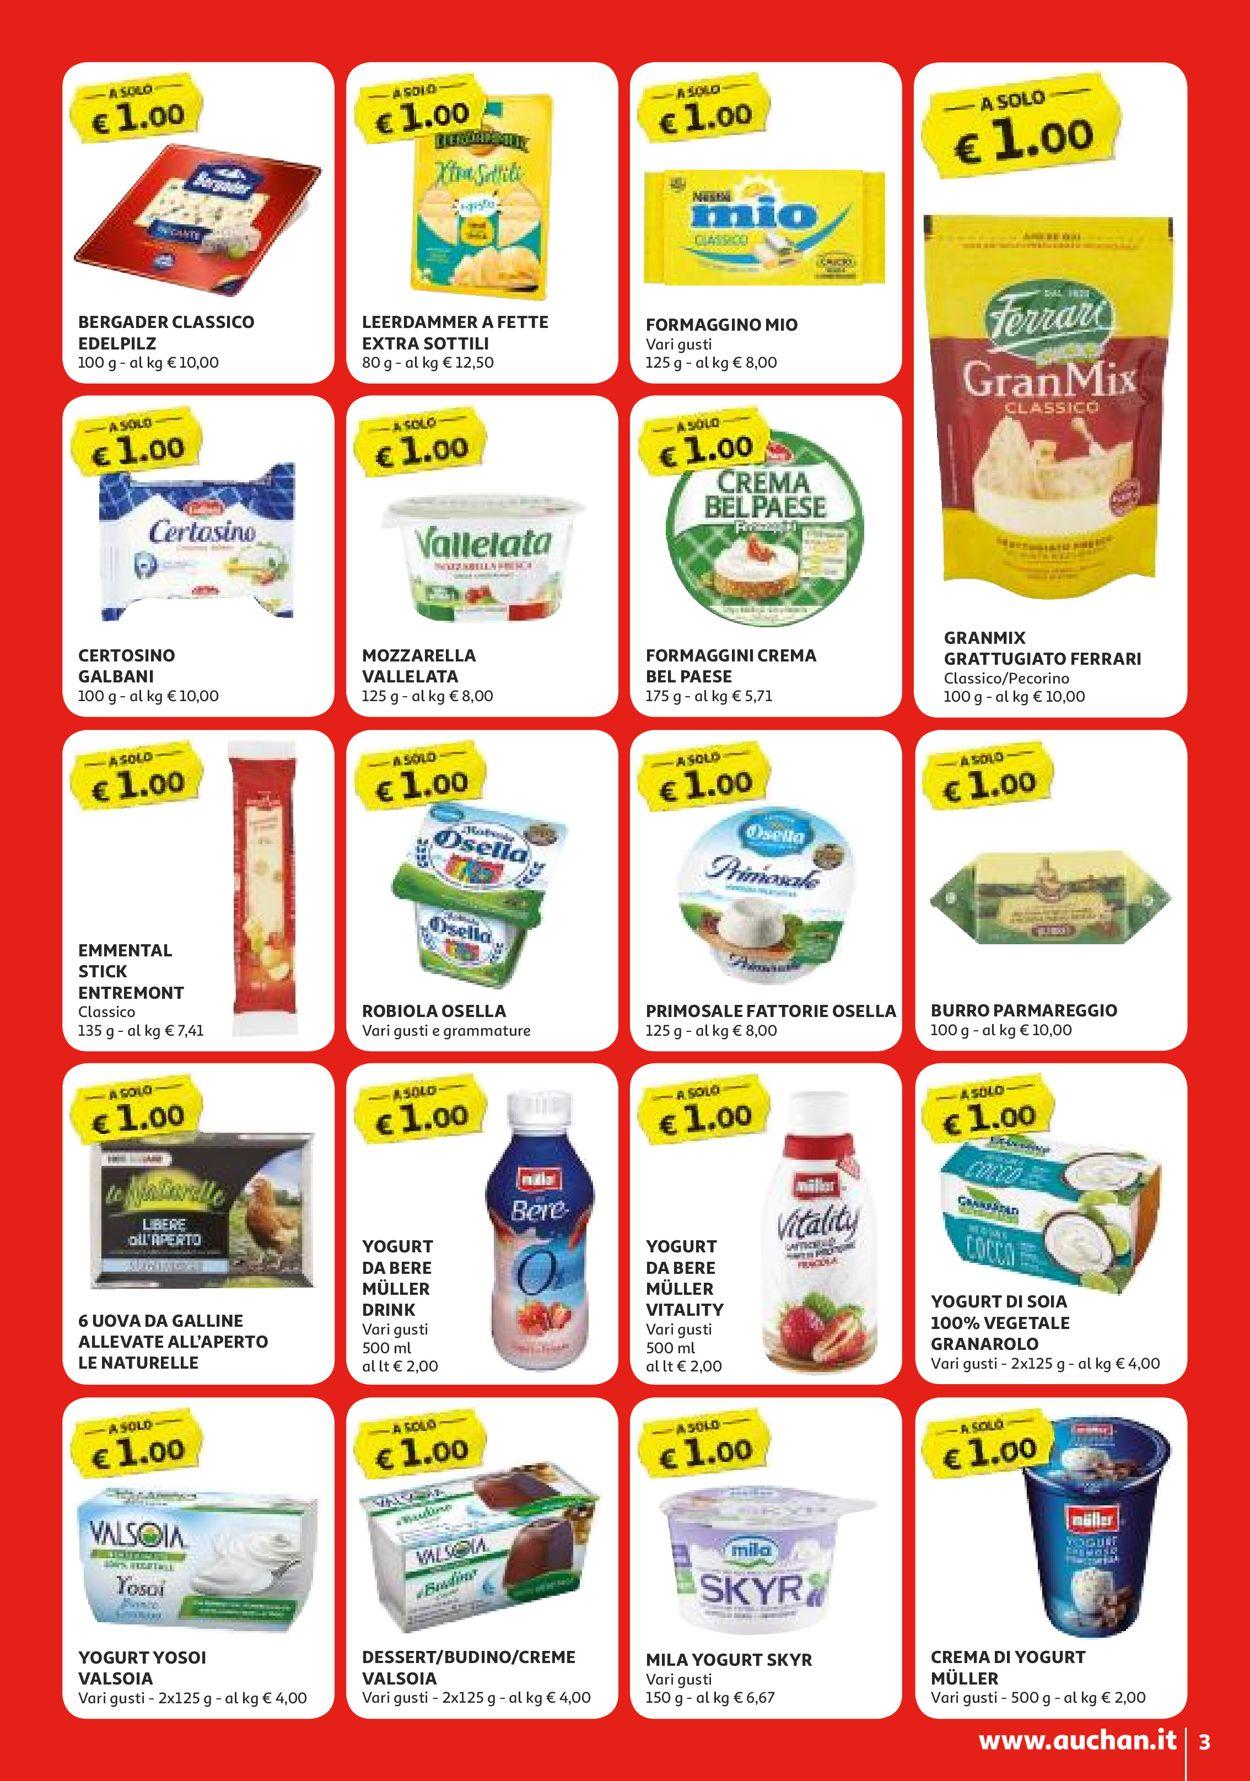 Volantino Auchan - Offerte 14/04-22/04/2020 (Pagina 3)